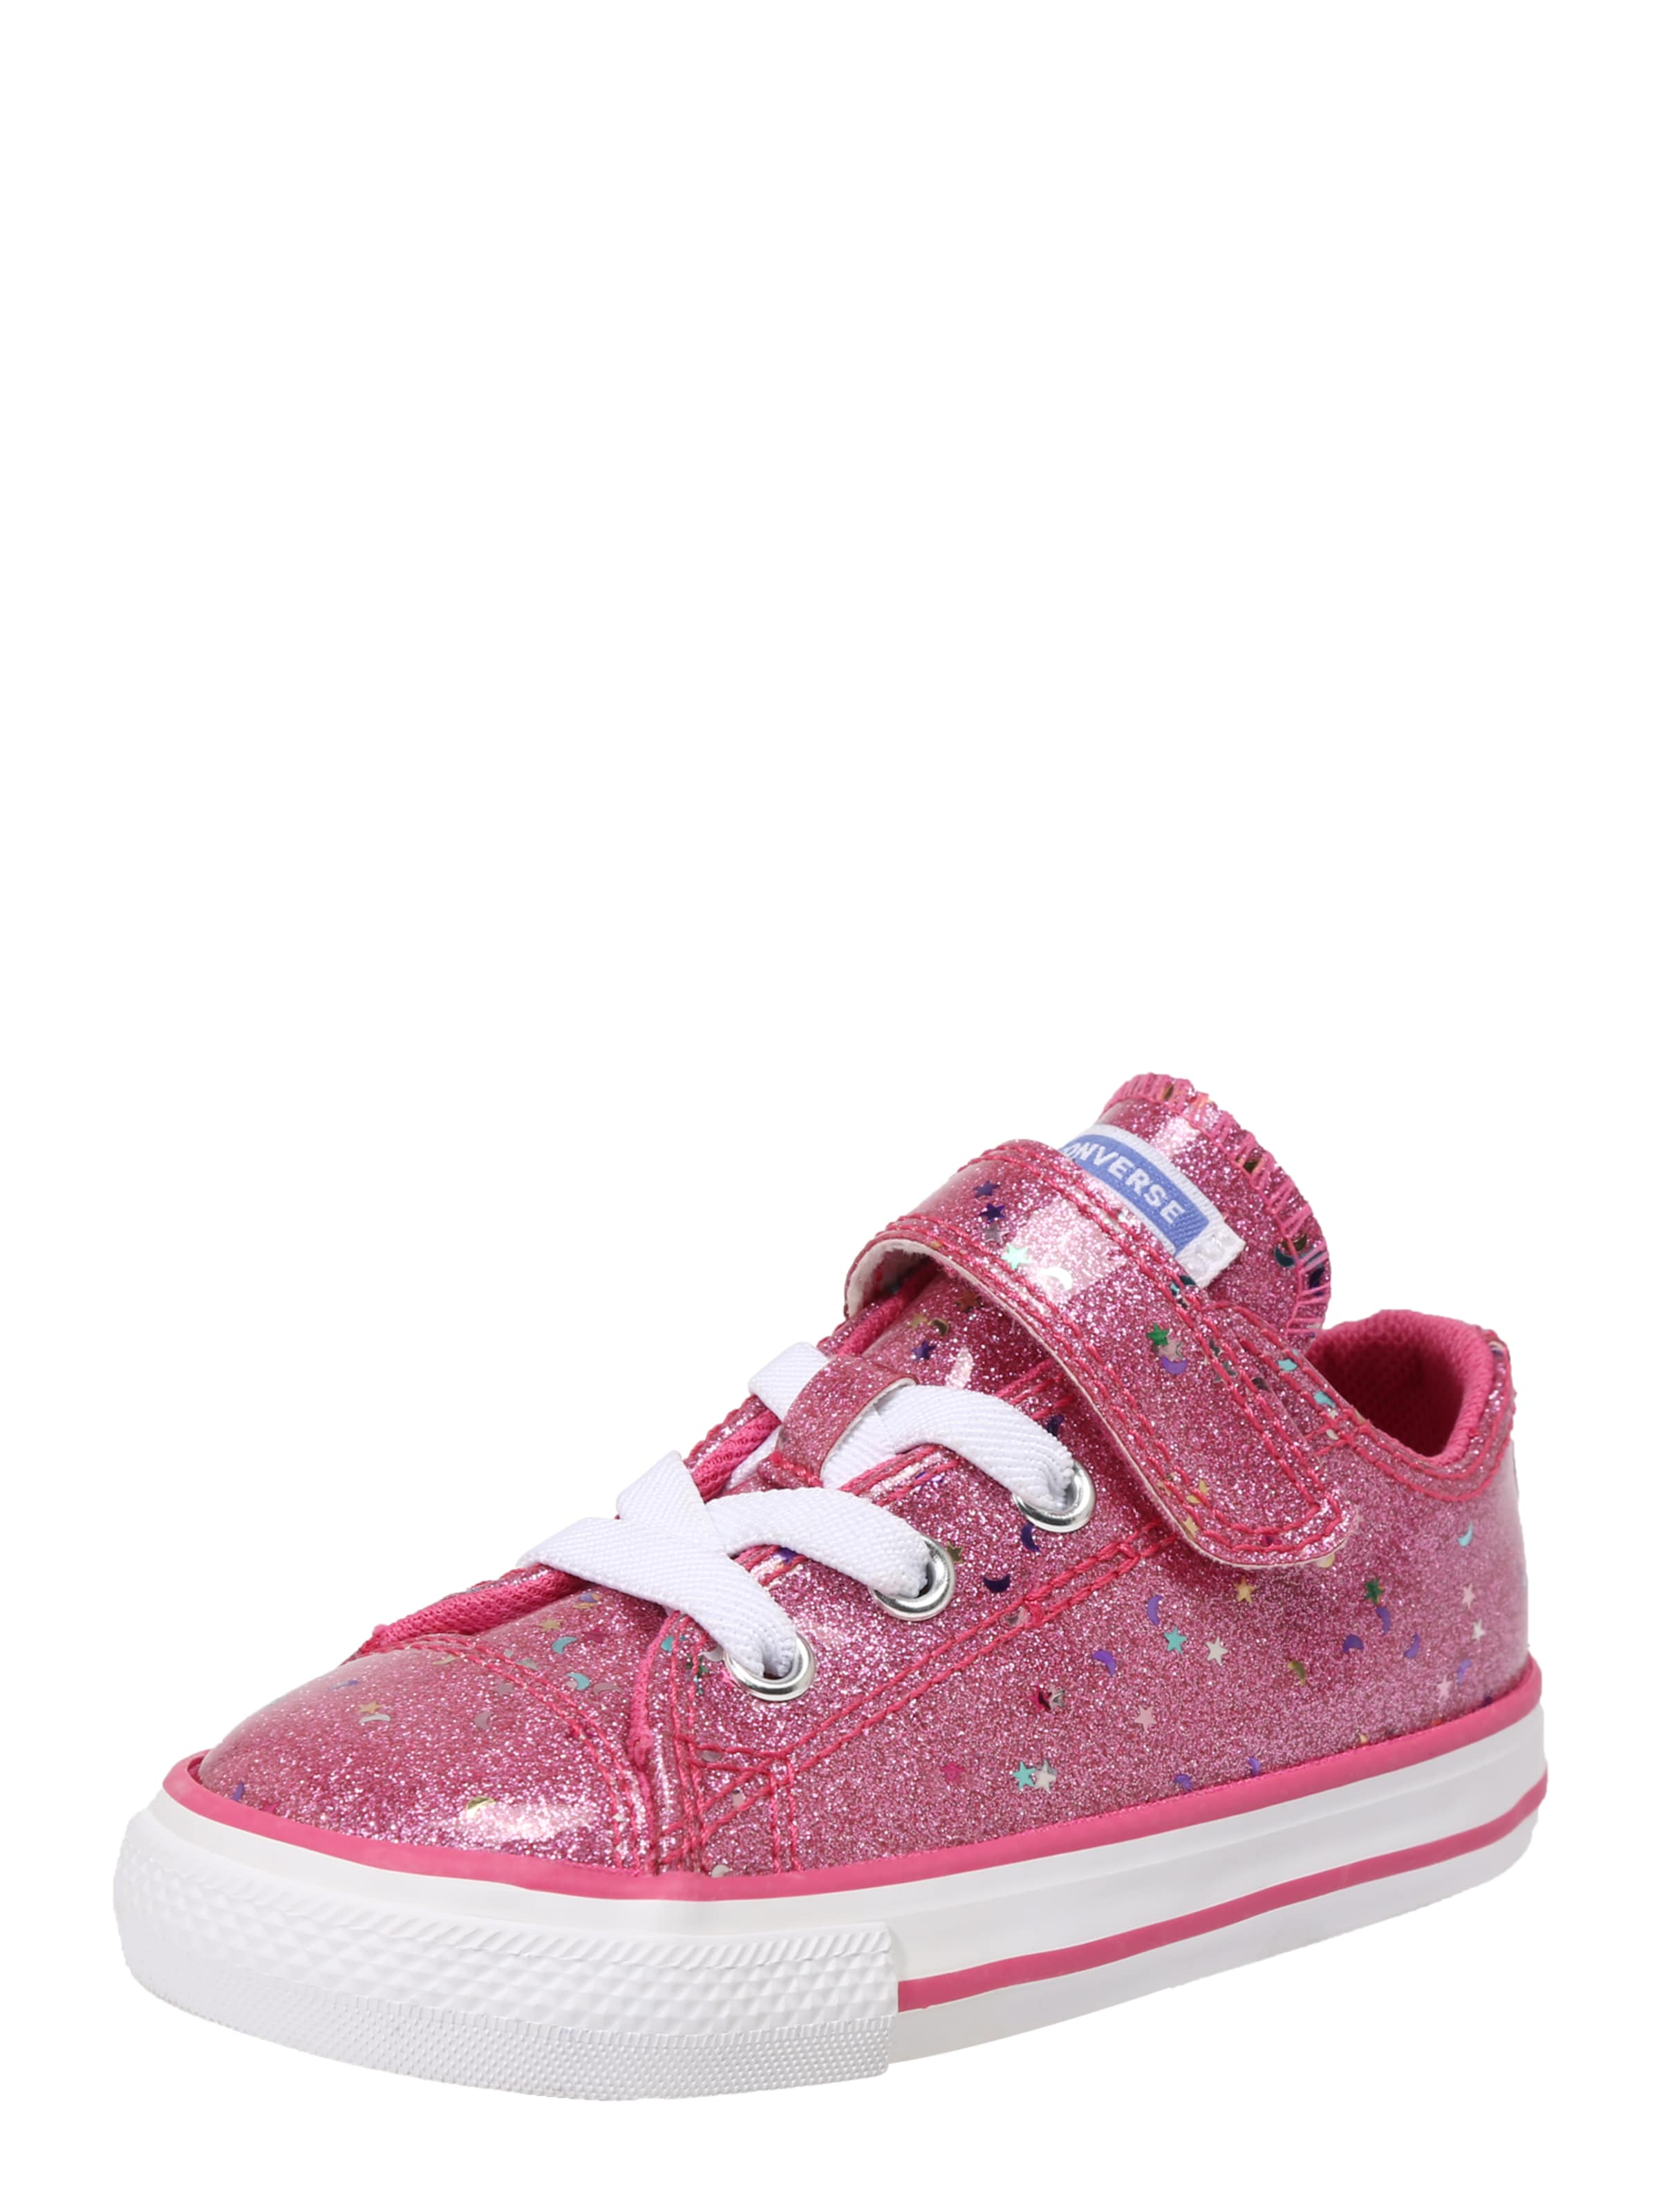 Kinder,  Mädchen,  Kinder Converse Sneaker 'Galaxy glimme' rosa | 00888757187706